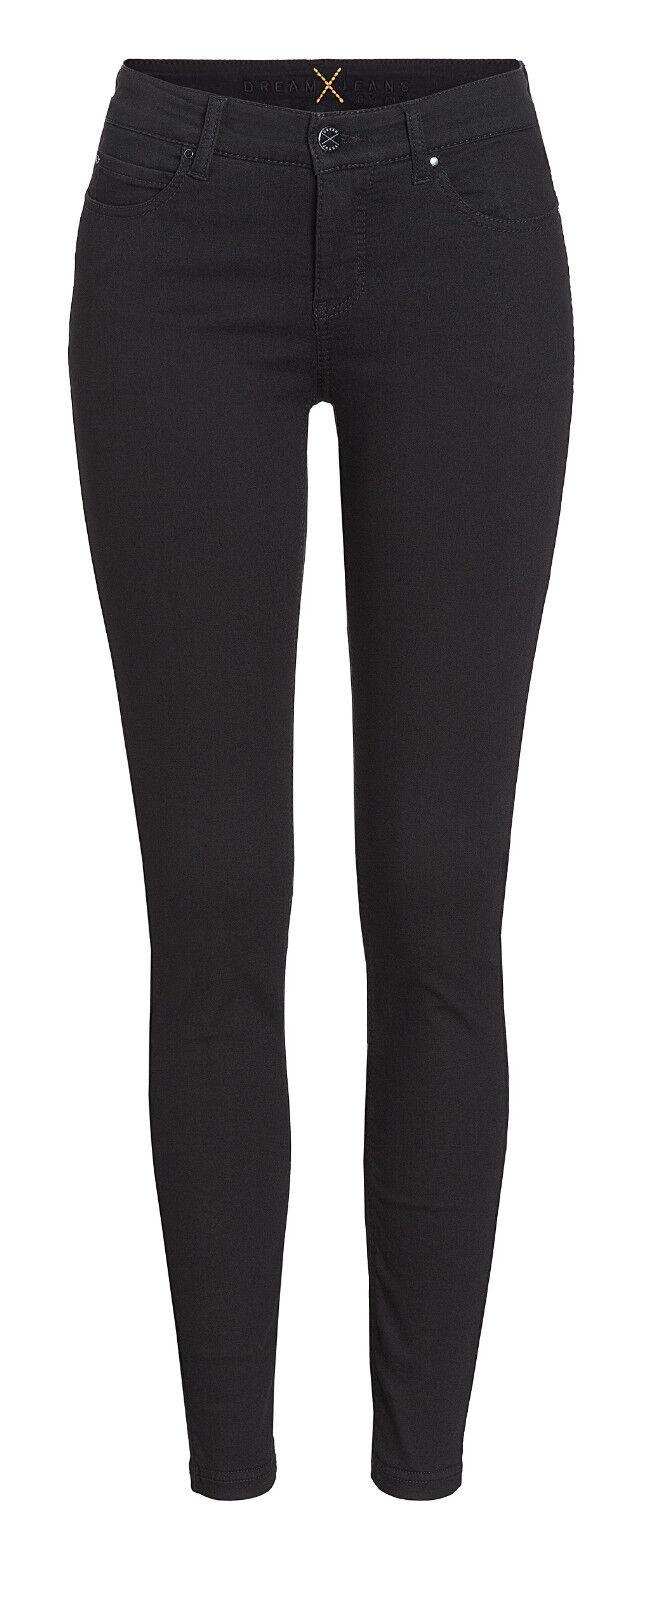 MAC Damen Jeans Dream Skinny 5402 NEU schwarz D999 Alle Größen Längen